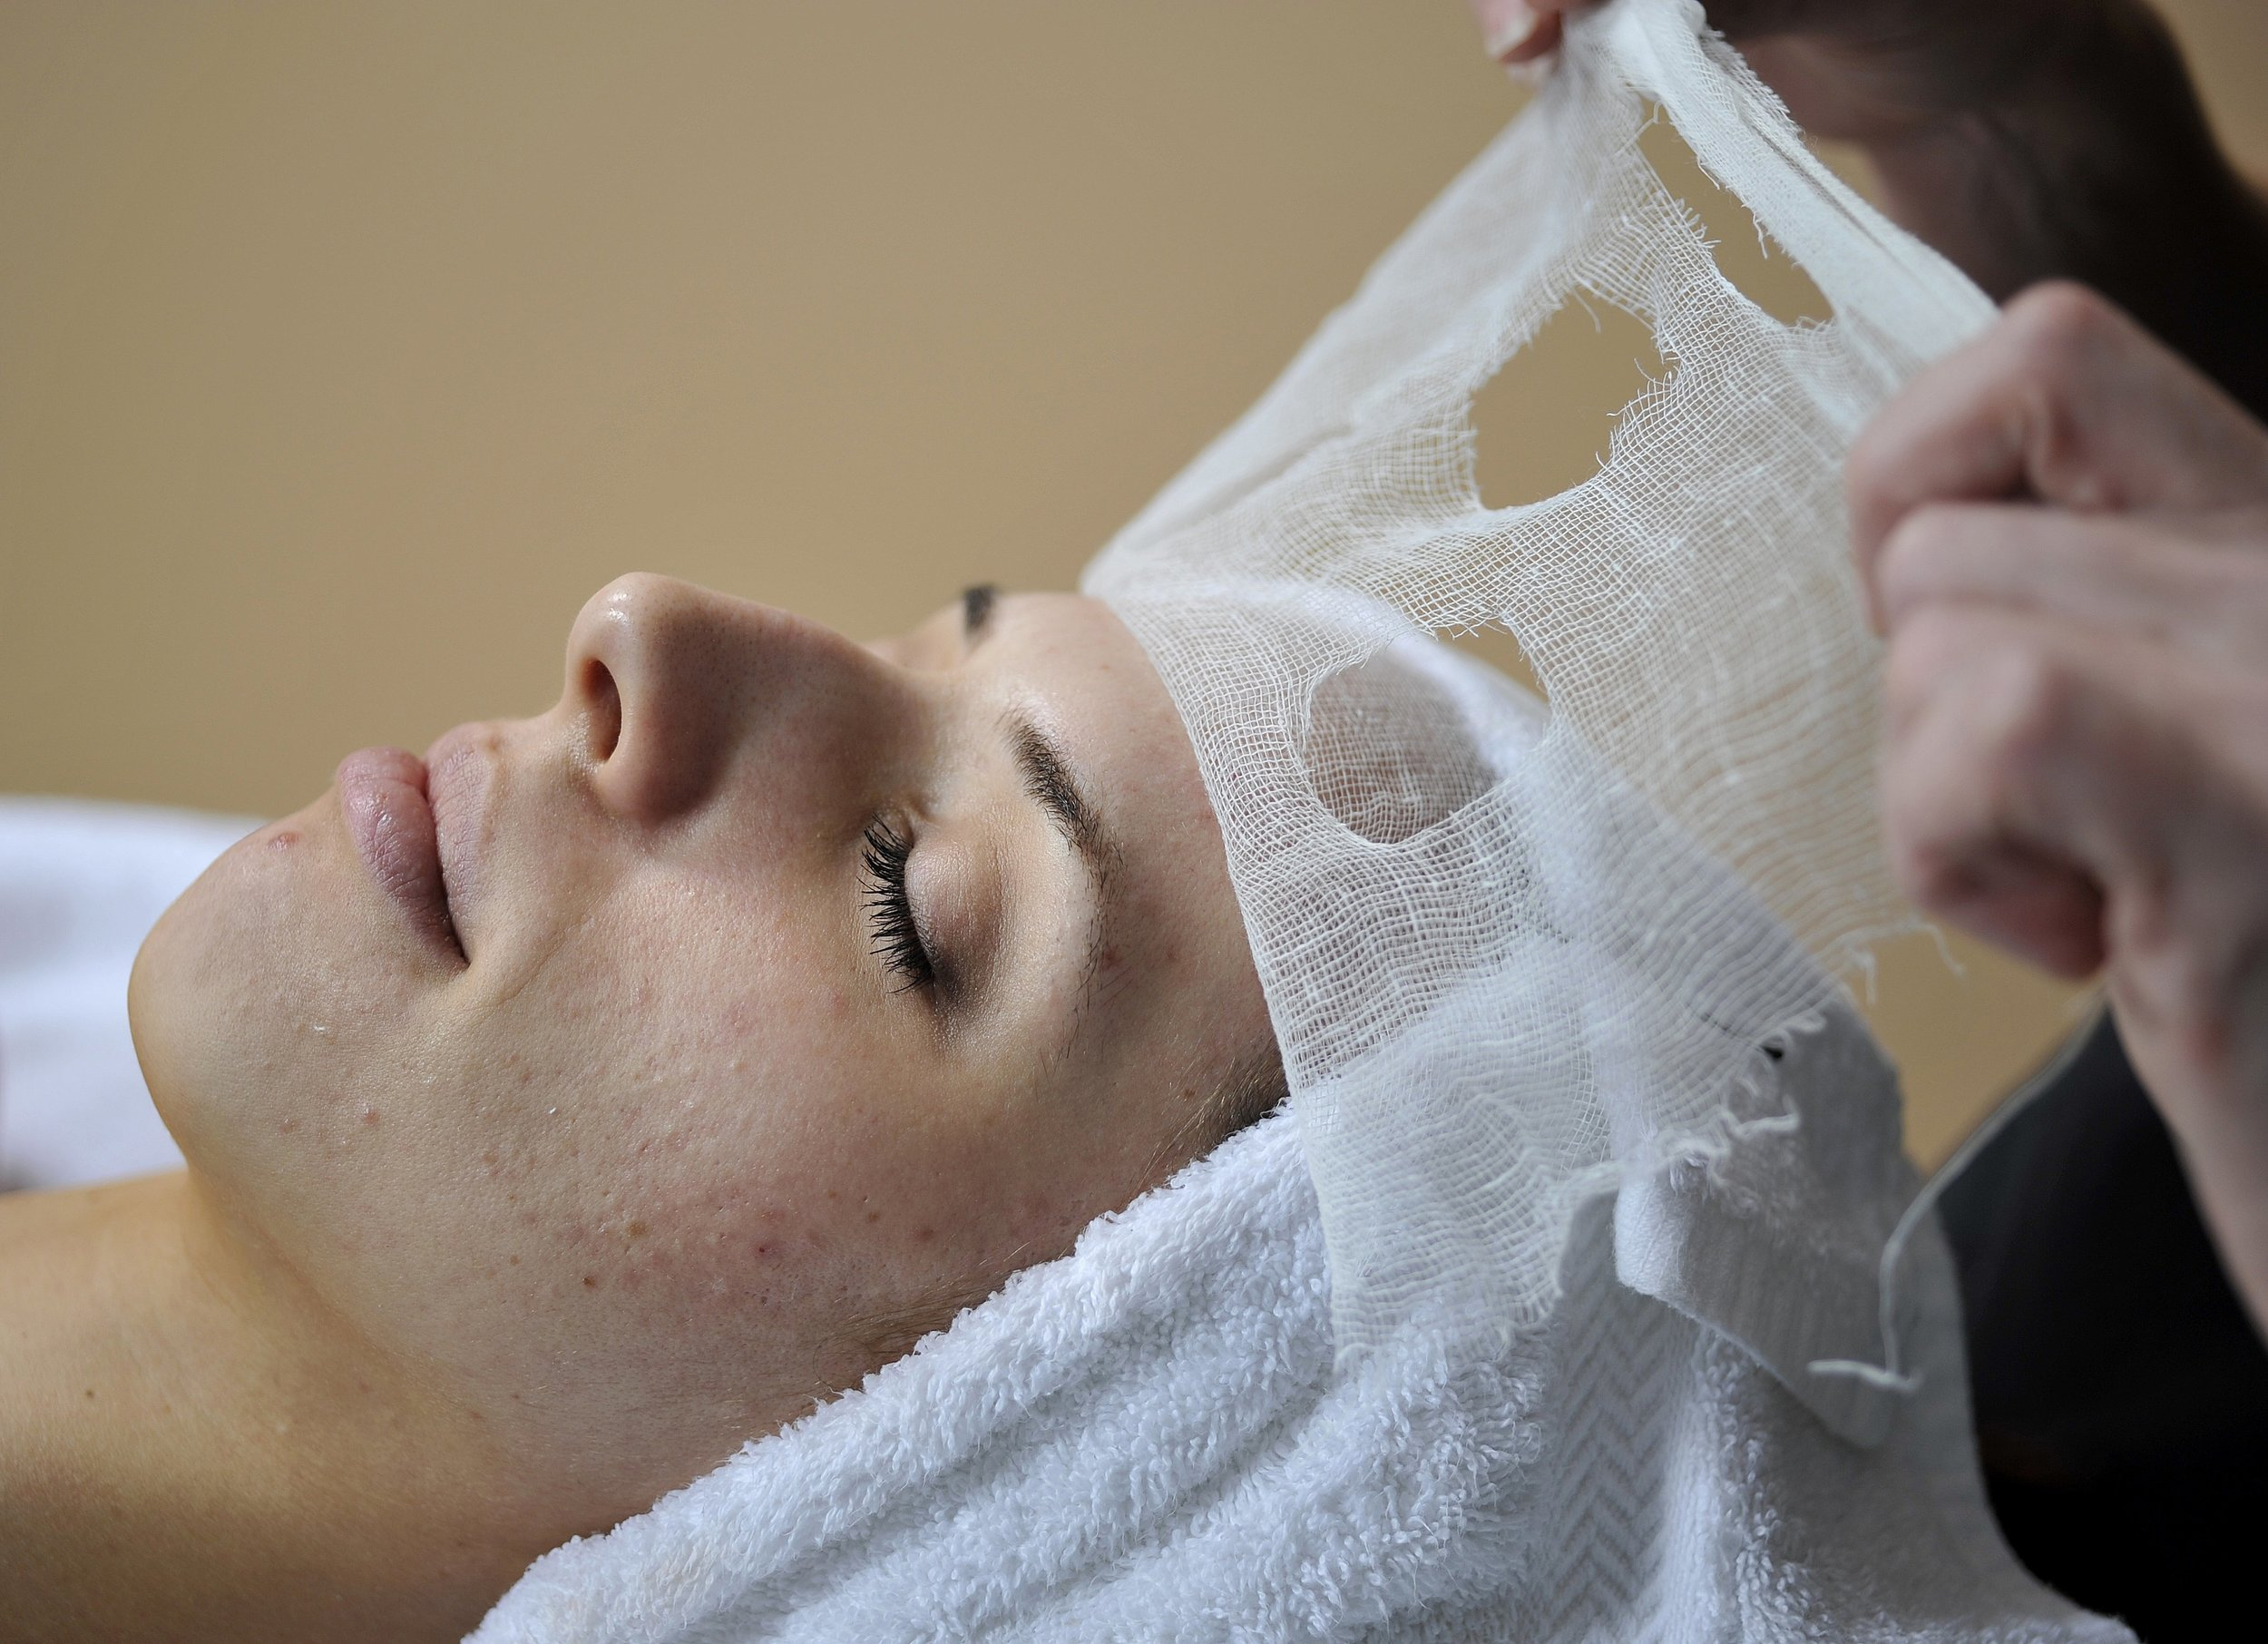 acne 4.jpg